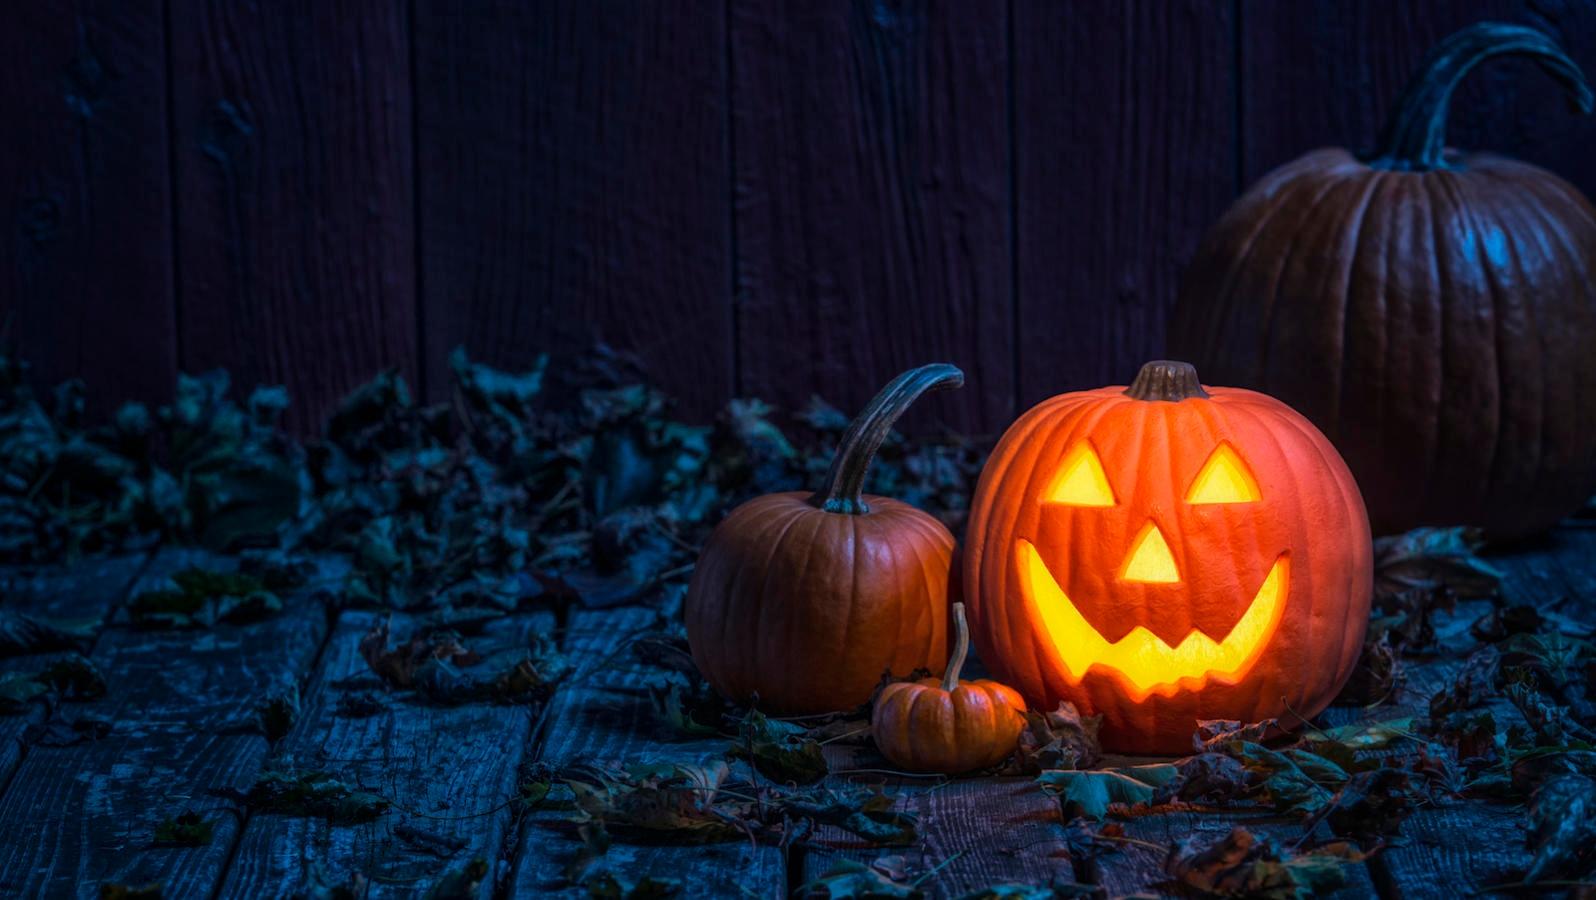 Should Jews Trick-or-Treat on Halloween?